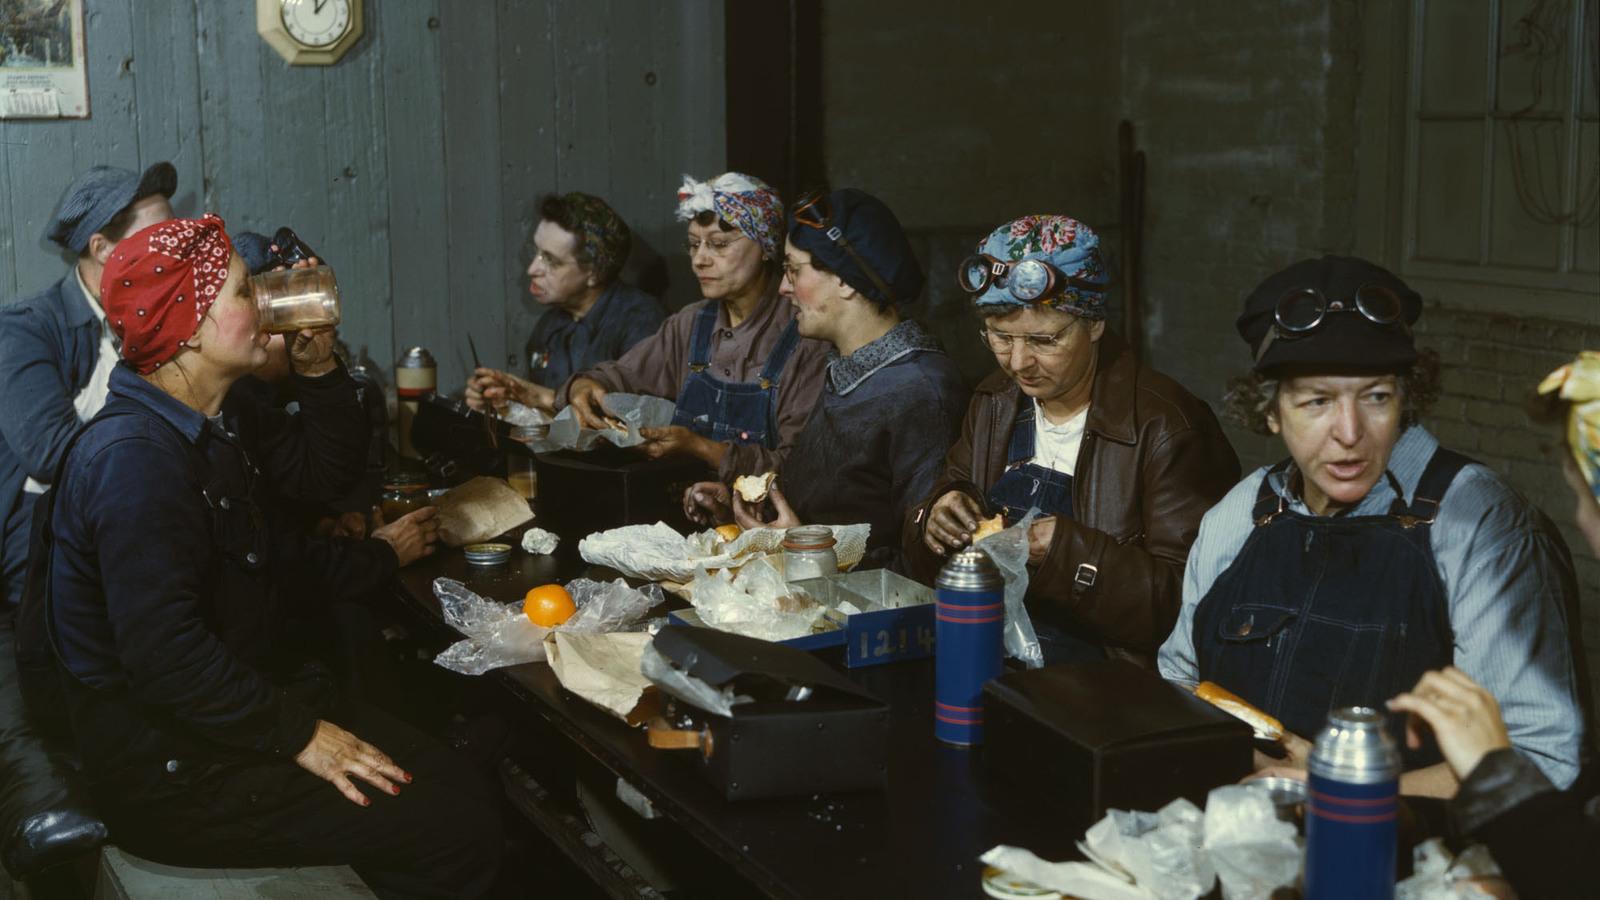 Wipers-eating-lunch-Clinton-Iowa-19391.jpg